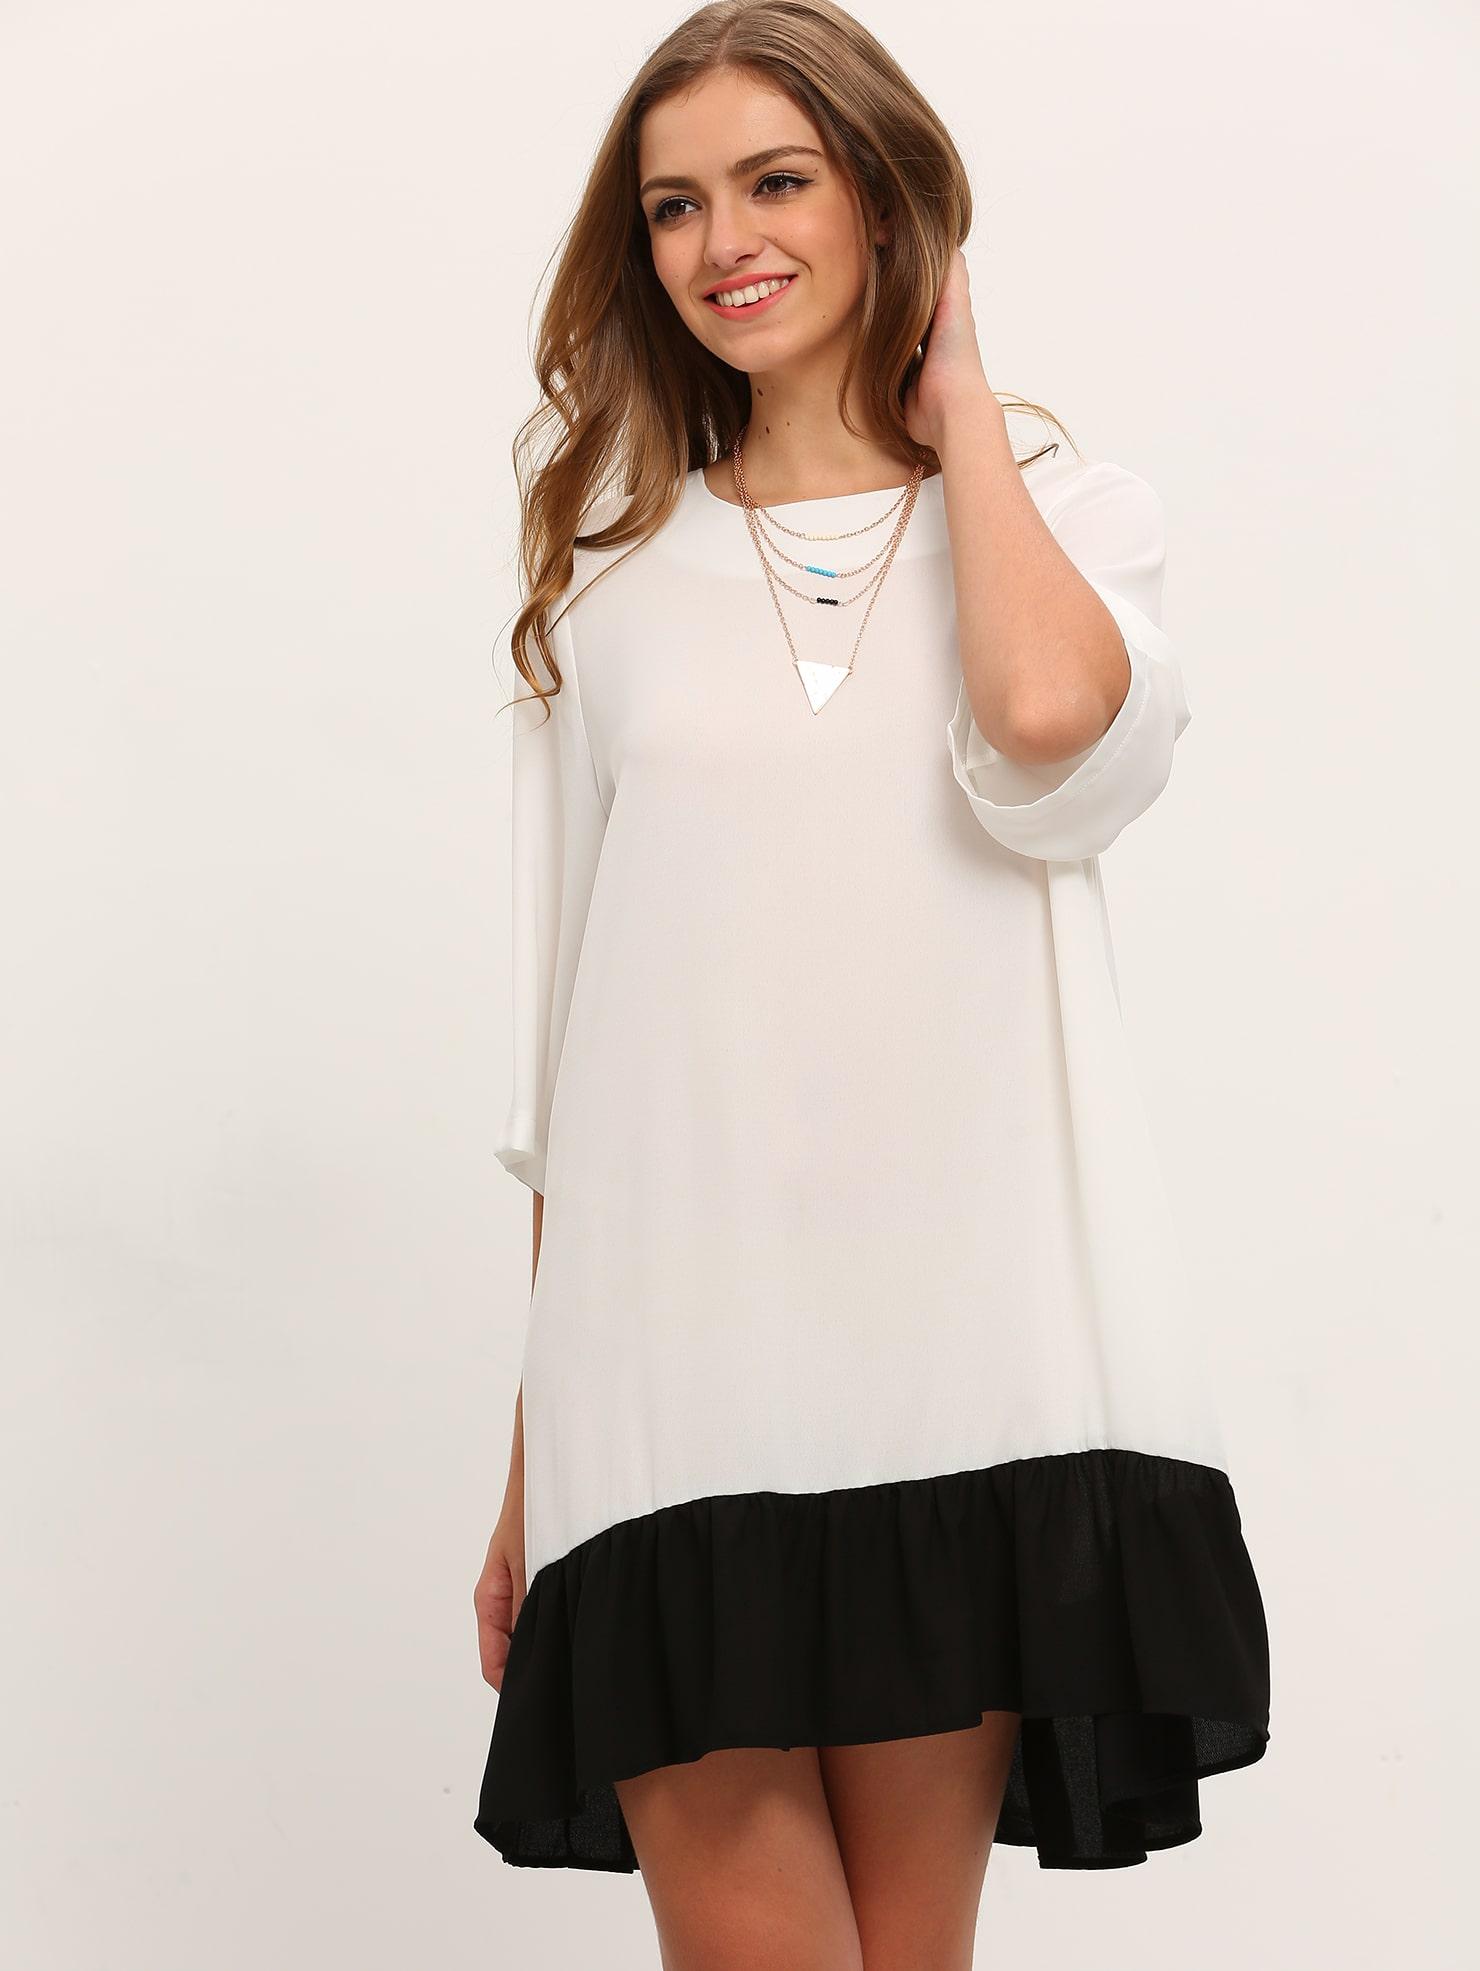 Black White Half Sleeve Shift Dress dress160526721